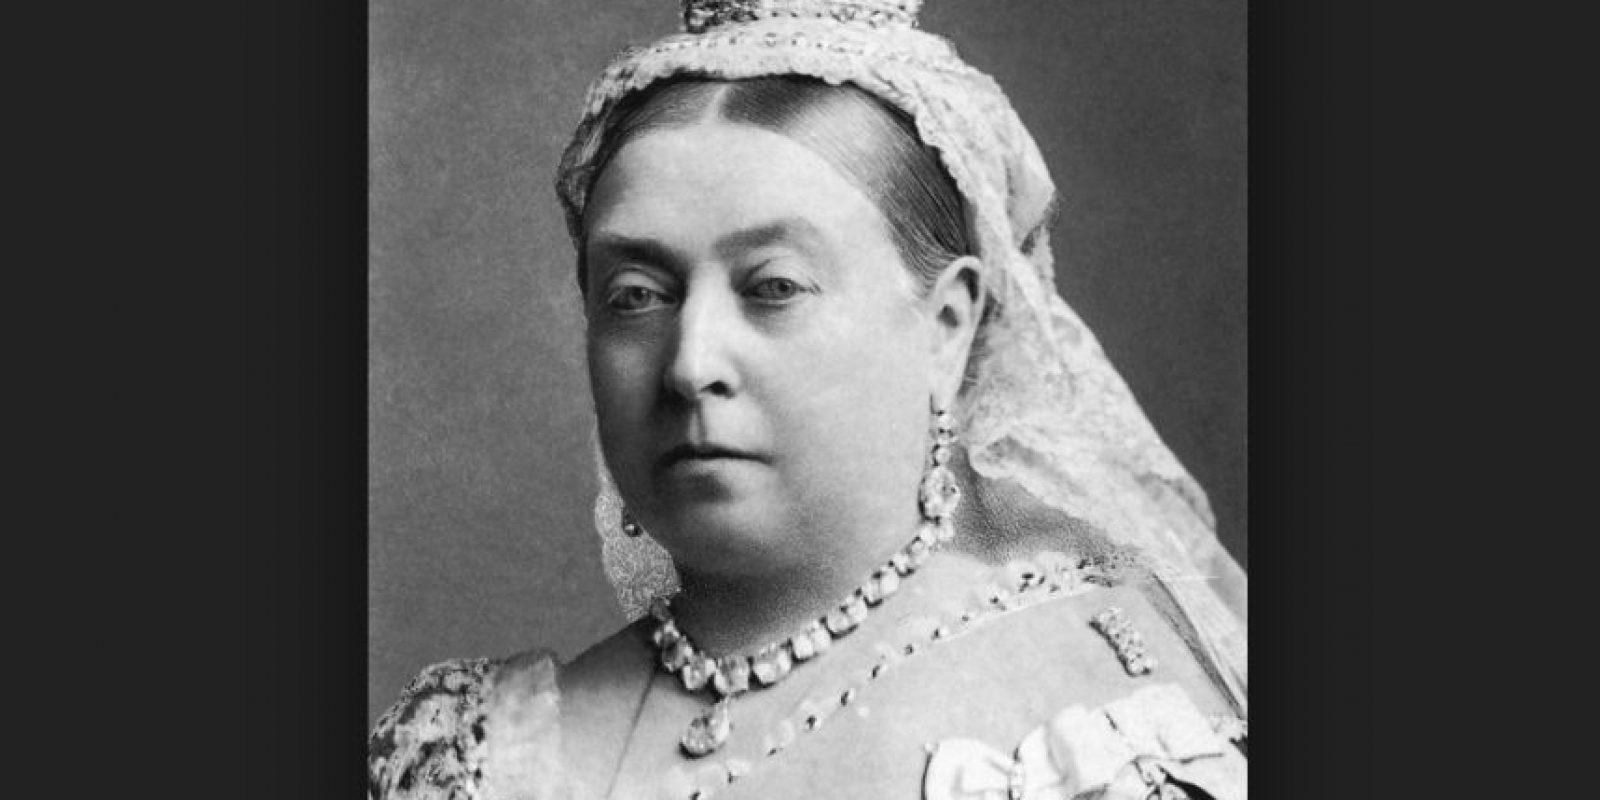 8. Reina Victoria (8 por ciento) Foto:Wikipedia.org